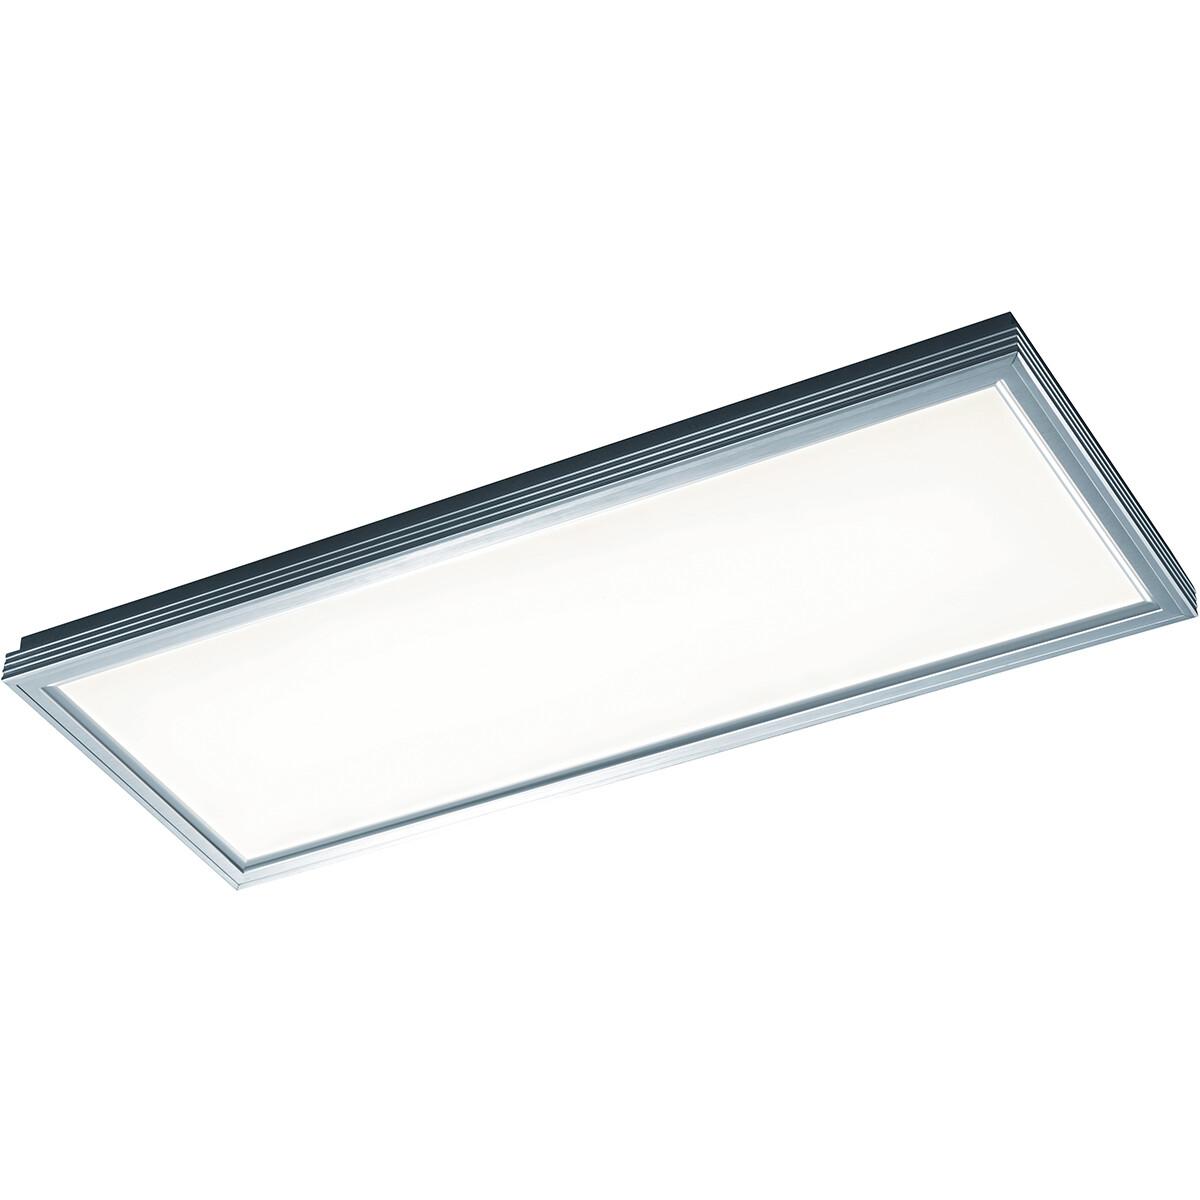 LED Plafondlamp - Trion Lokon - 30W - Warm Wit 3000K - Dimbaar - Rechthoek - Mat Wit - Kunststof